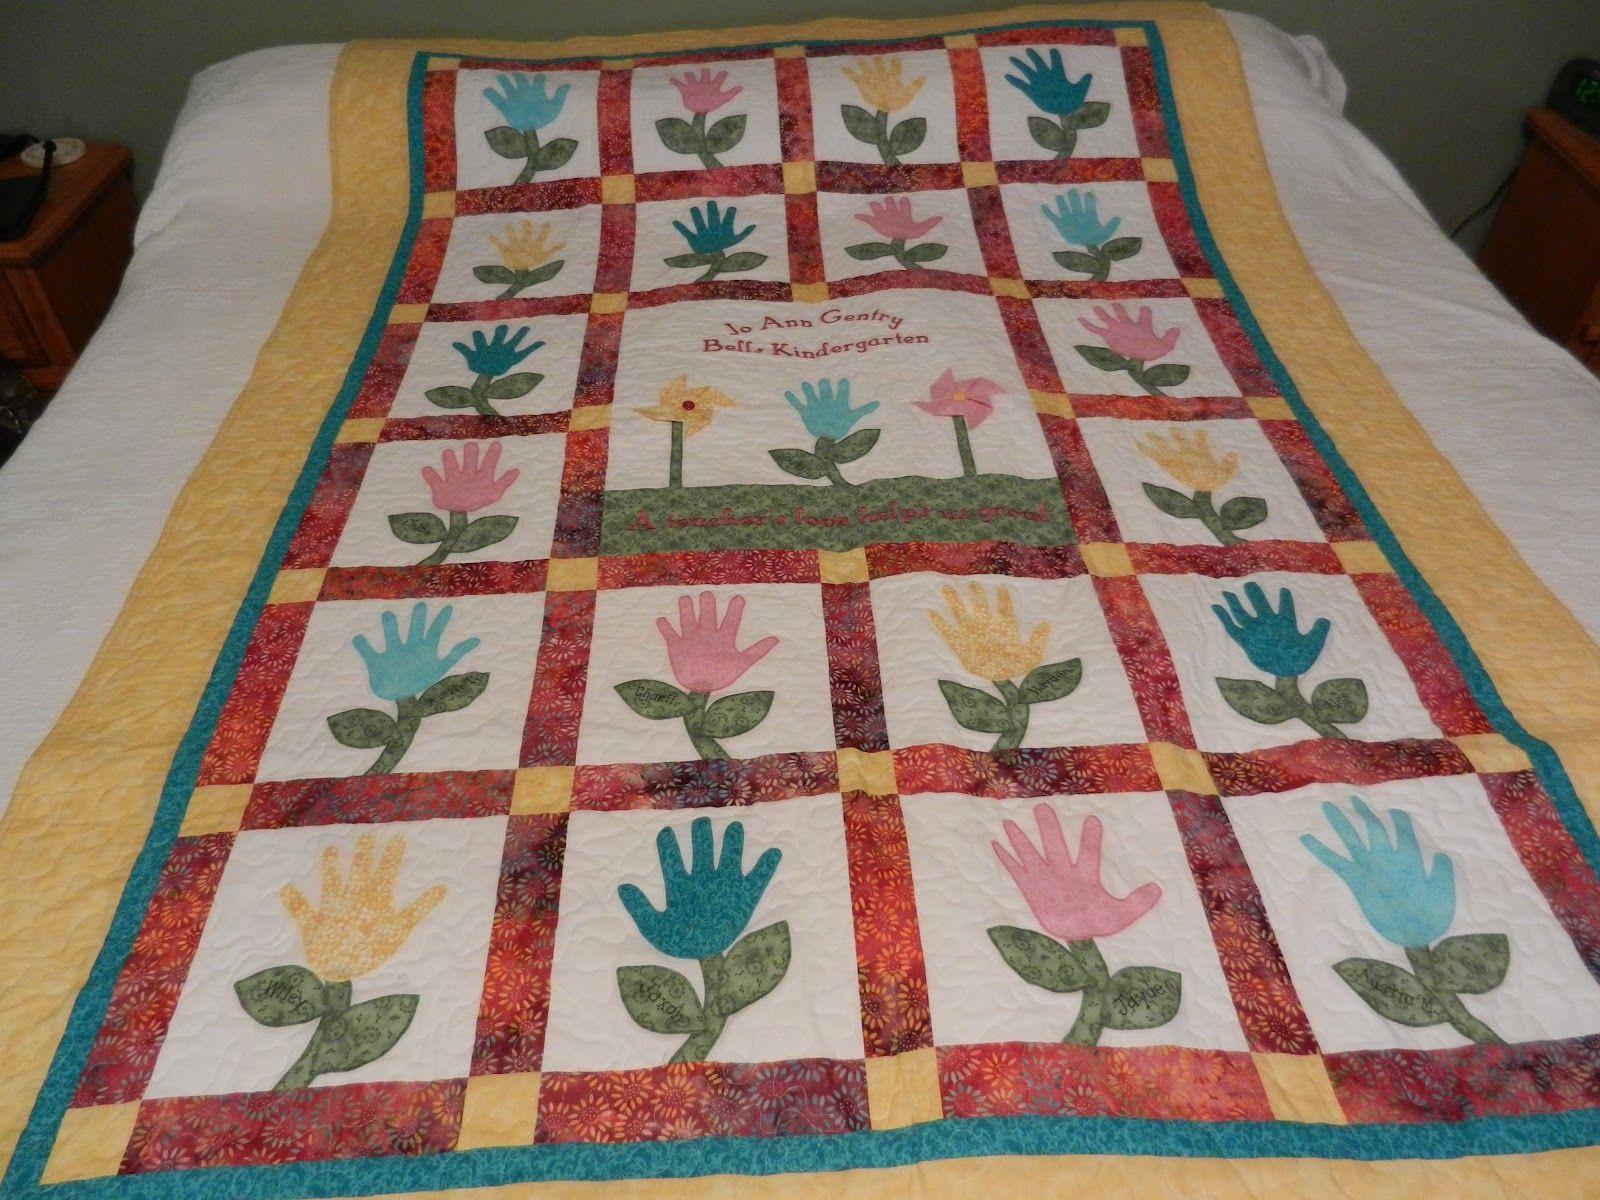 Another handprint quilt quilts quilts quilts quilts